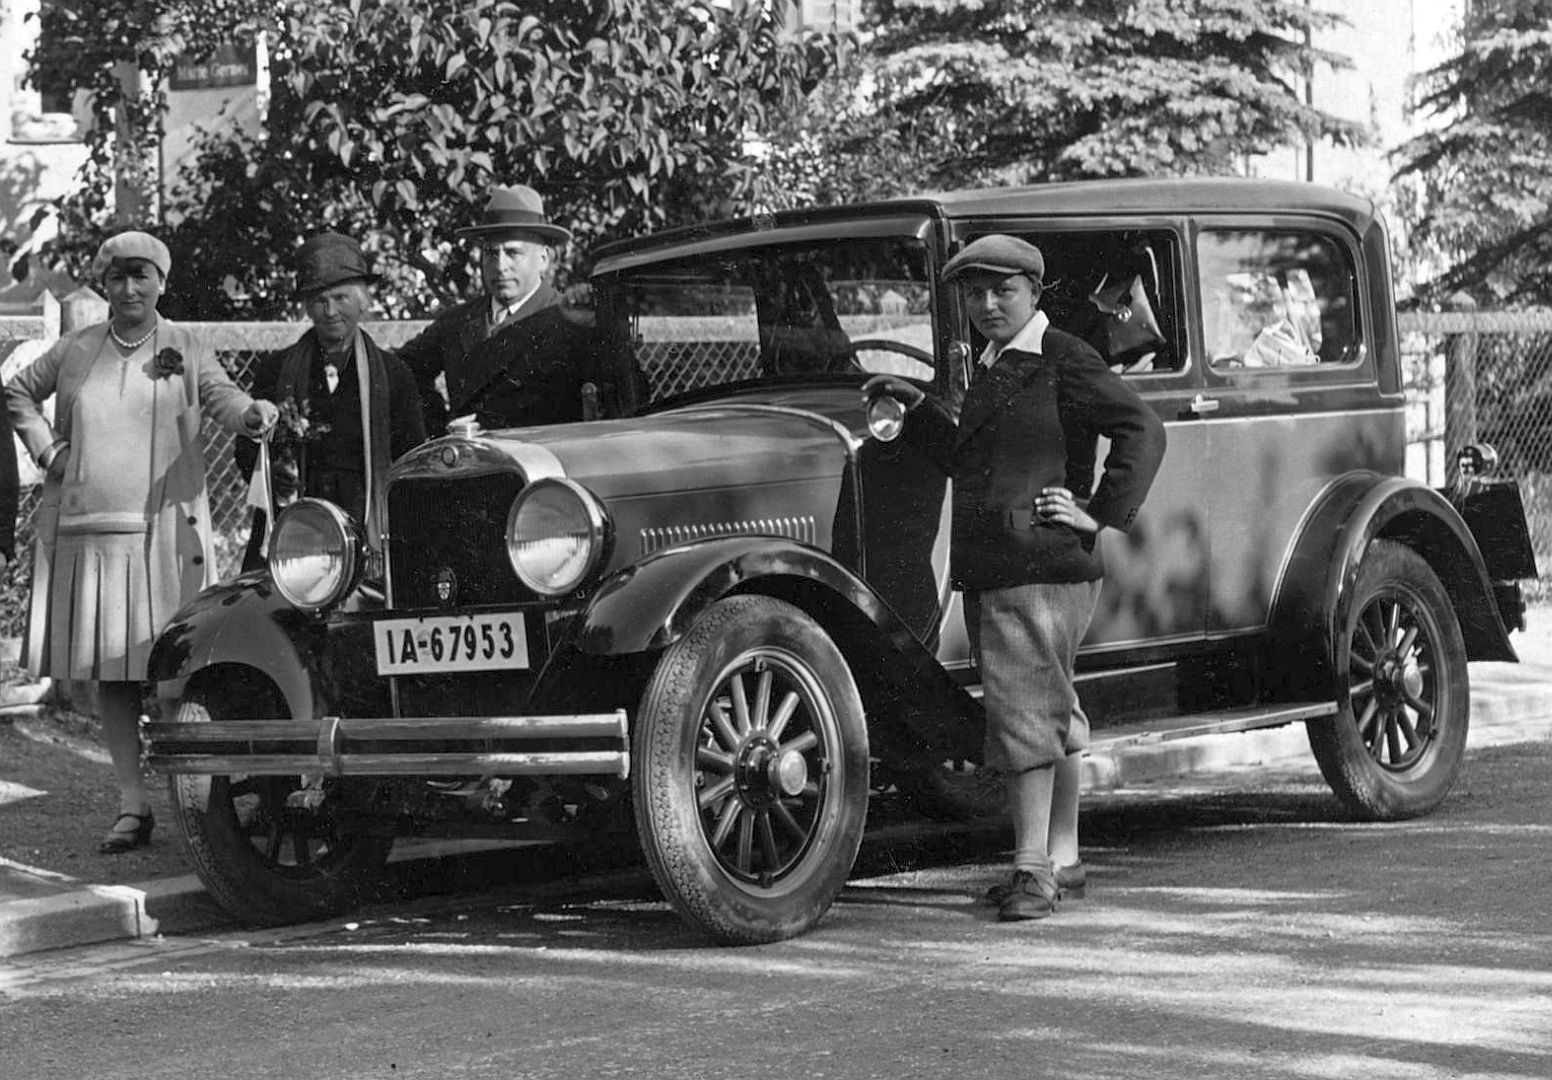 Studebaker_Erskine_1928_Ausschnitt1